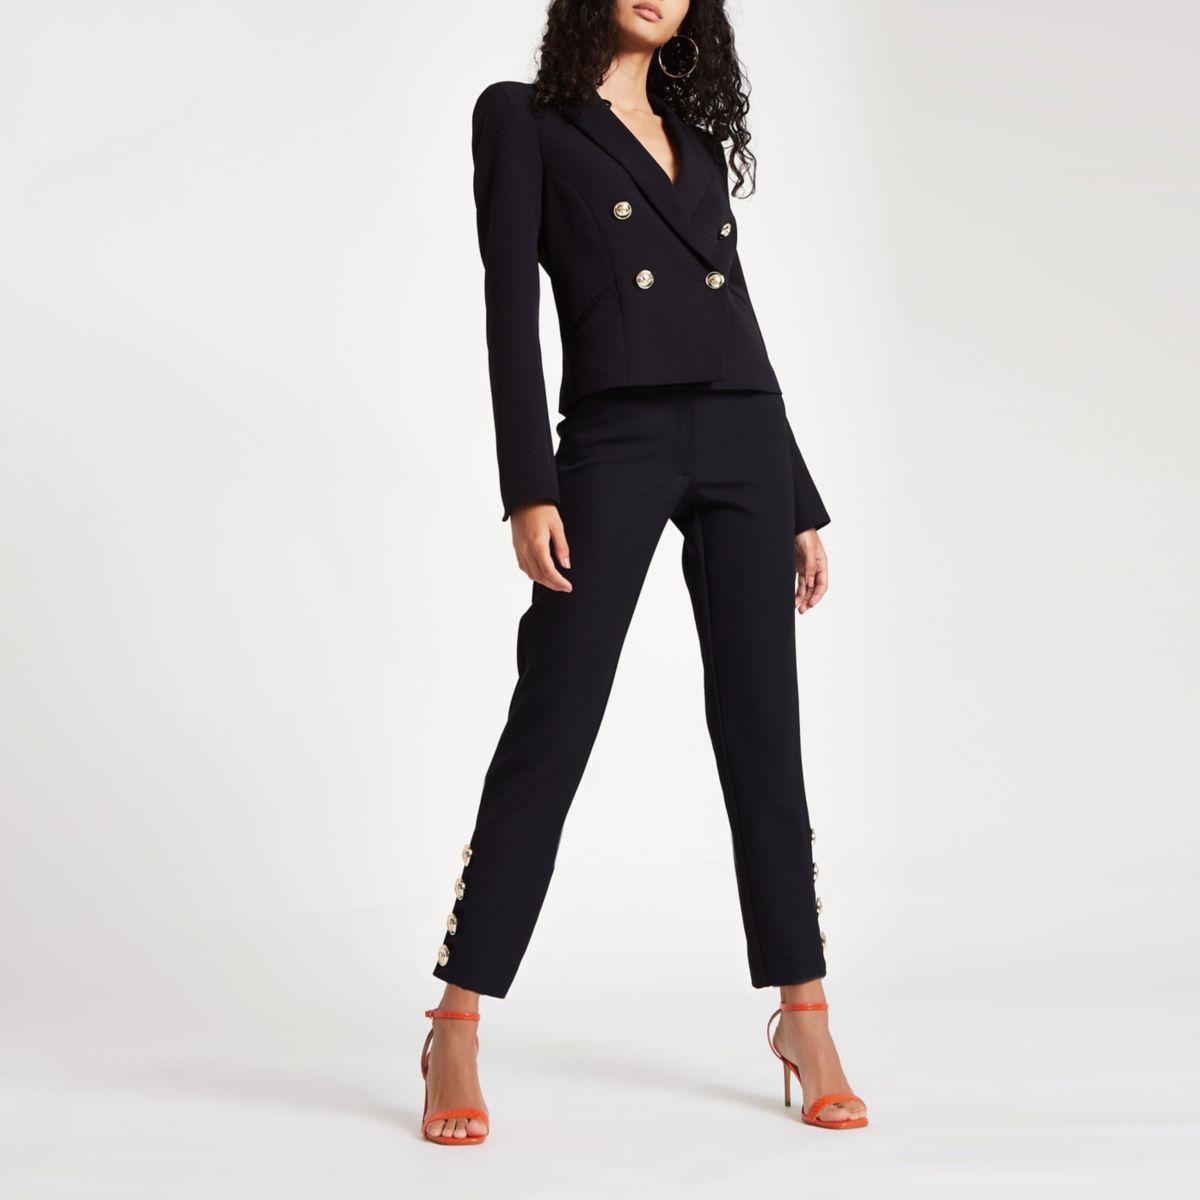 Black straight leg button trim pants